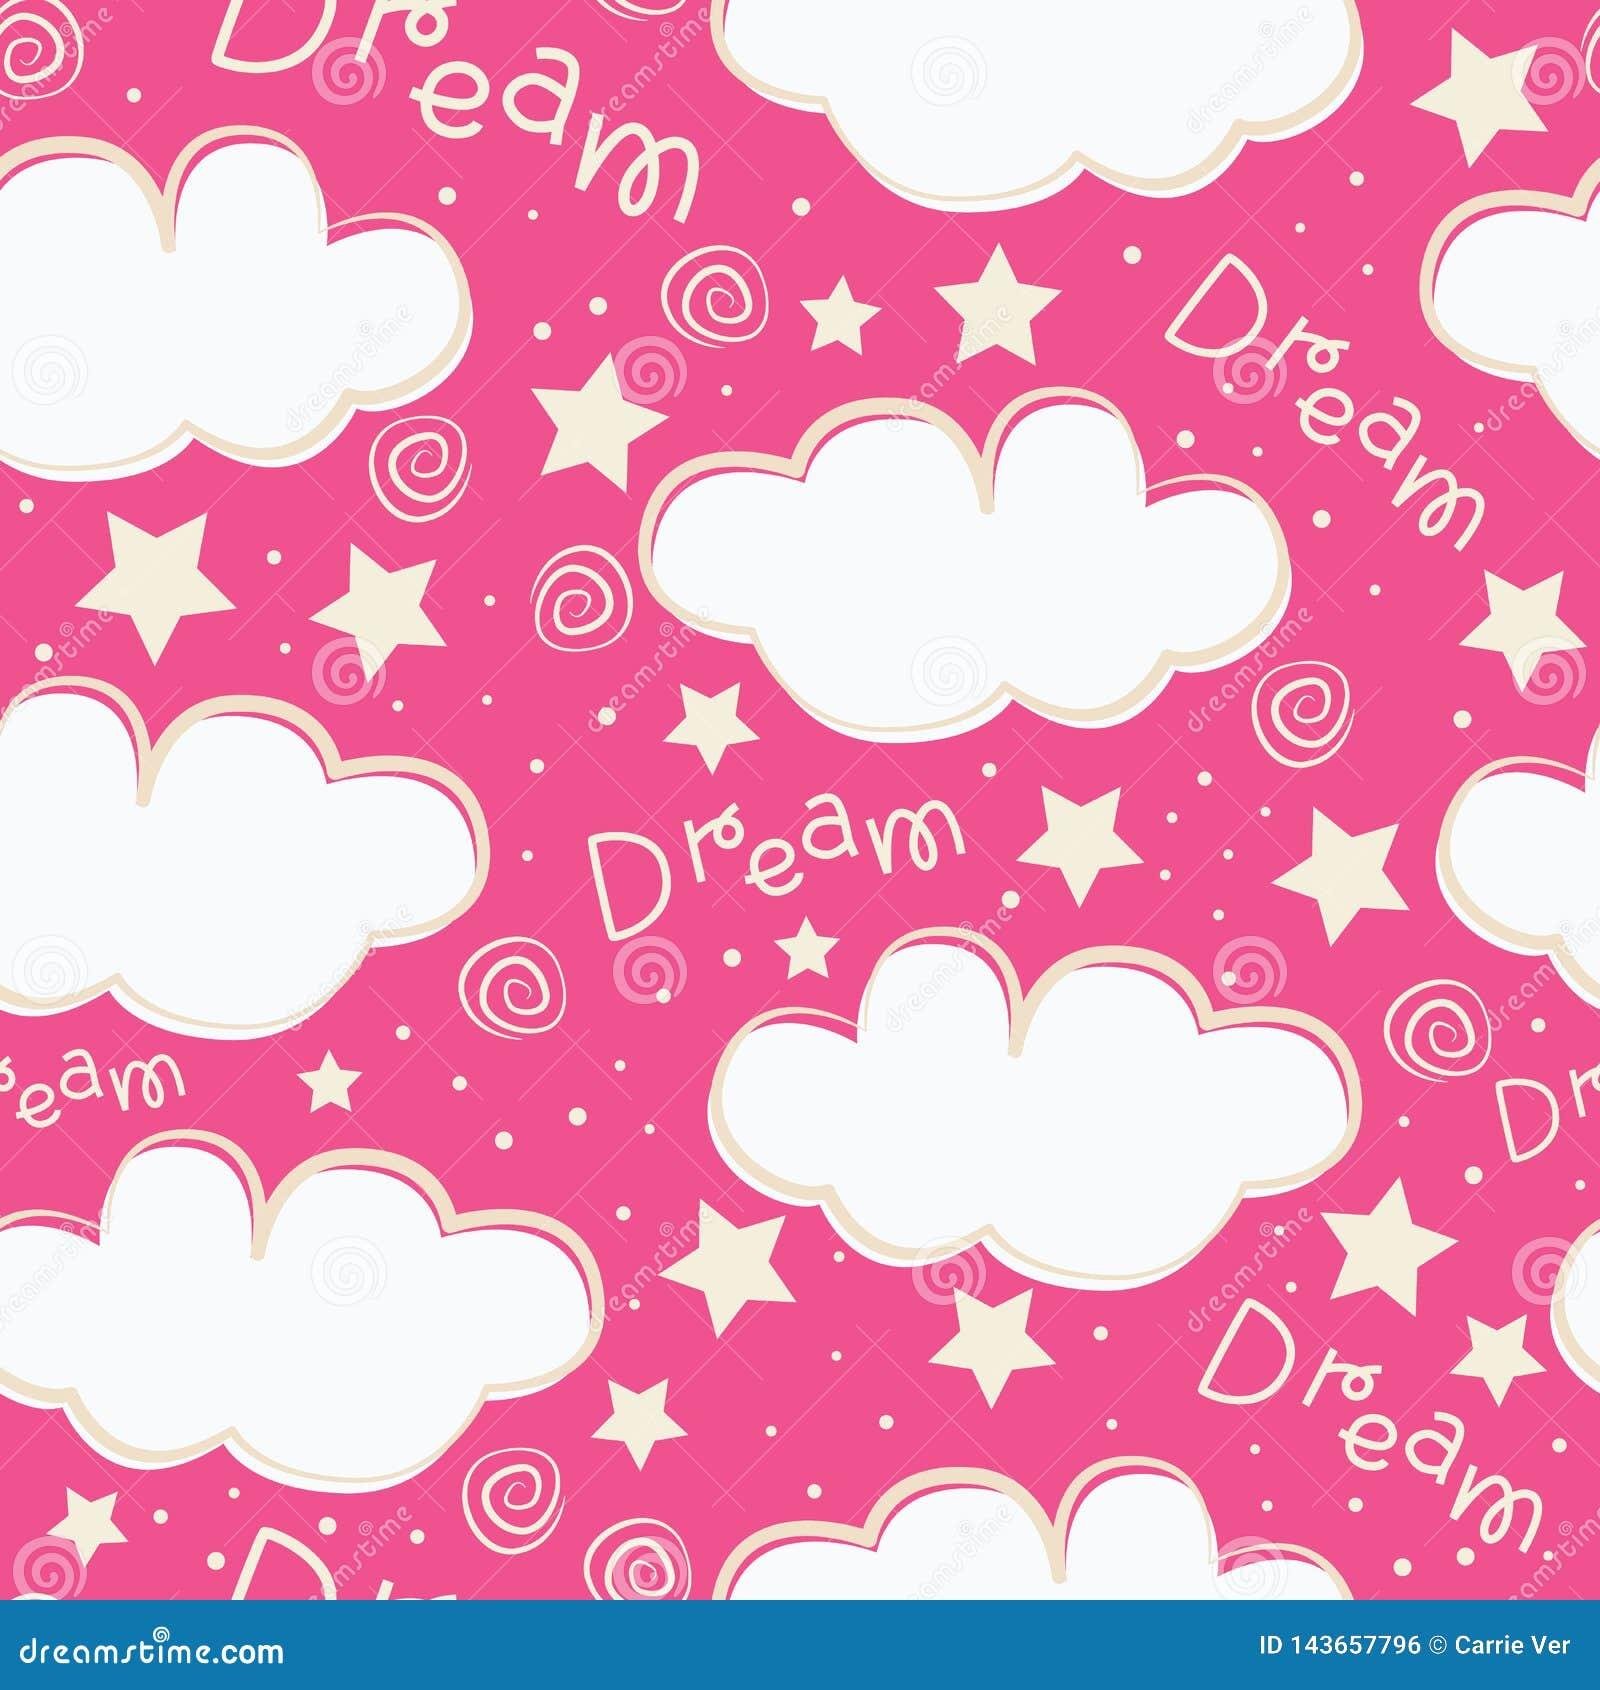 Clouds and stars kids seamless pattern design